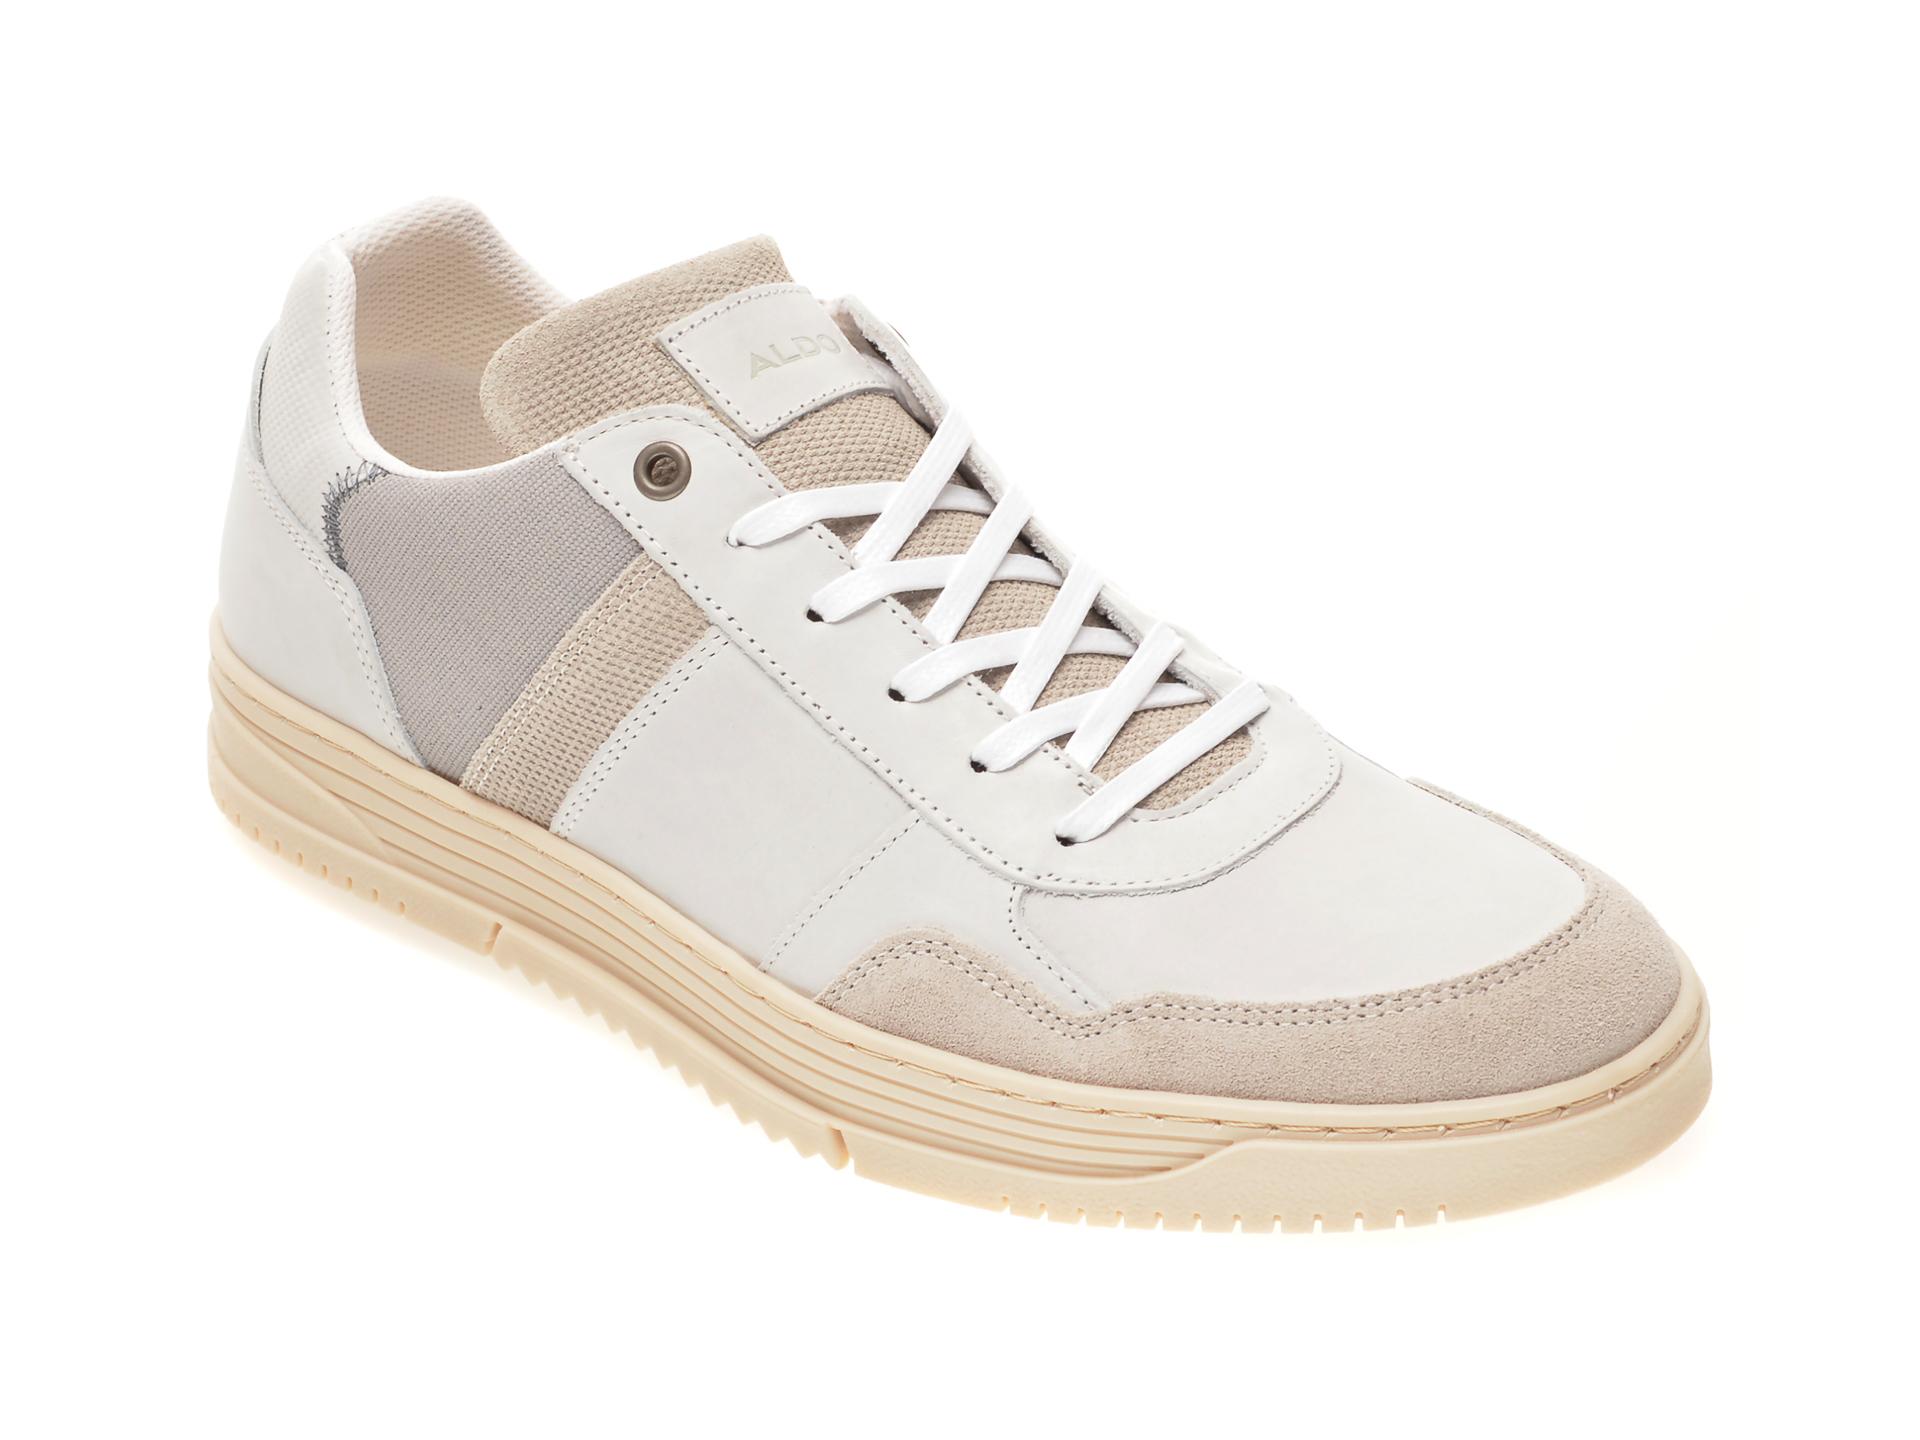 Pantofi sport ALDO gri, Kopiko100, din piele naturala imagine